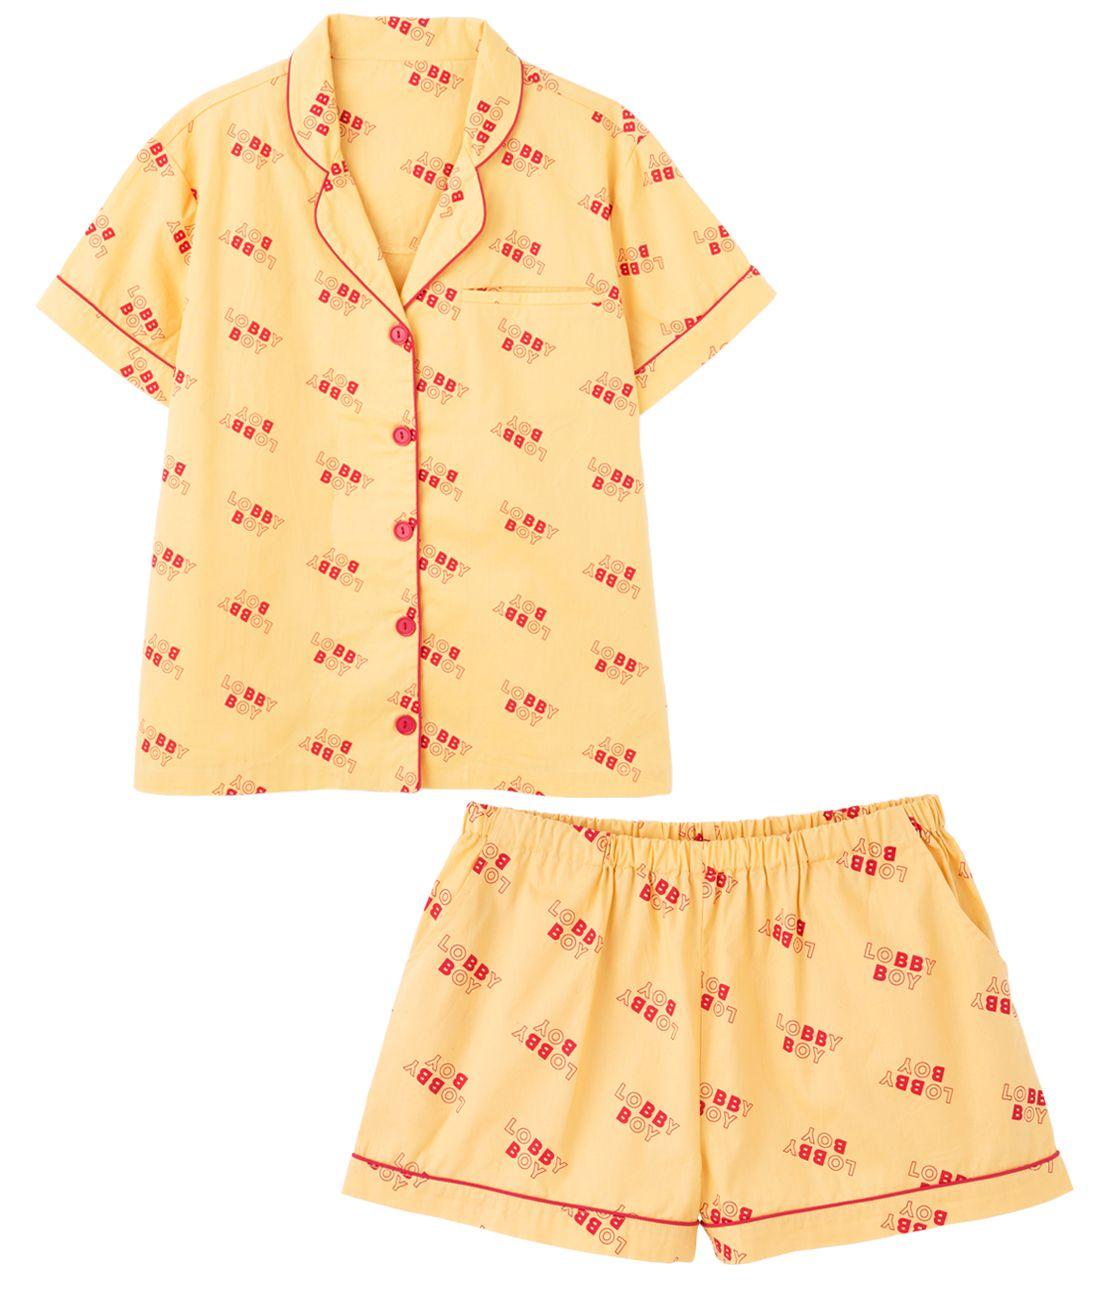 YM logo shirt pajamas